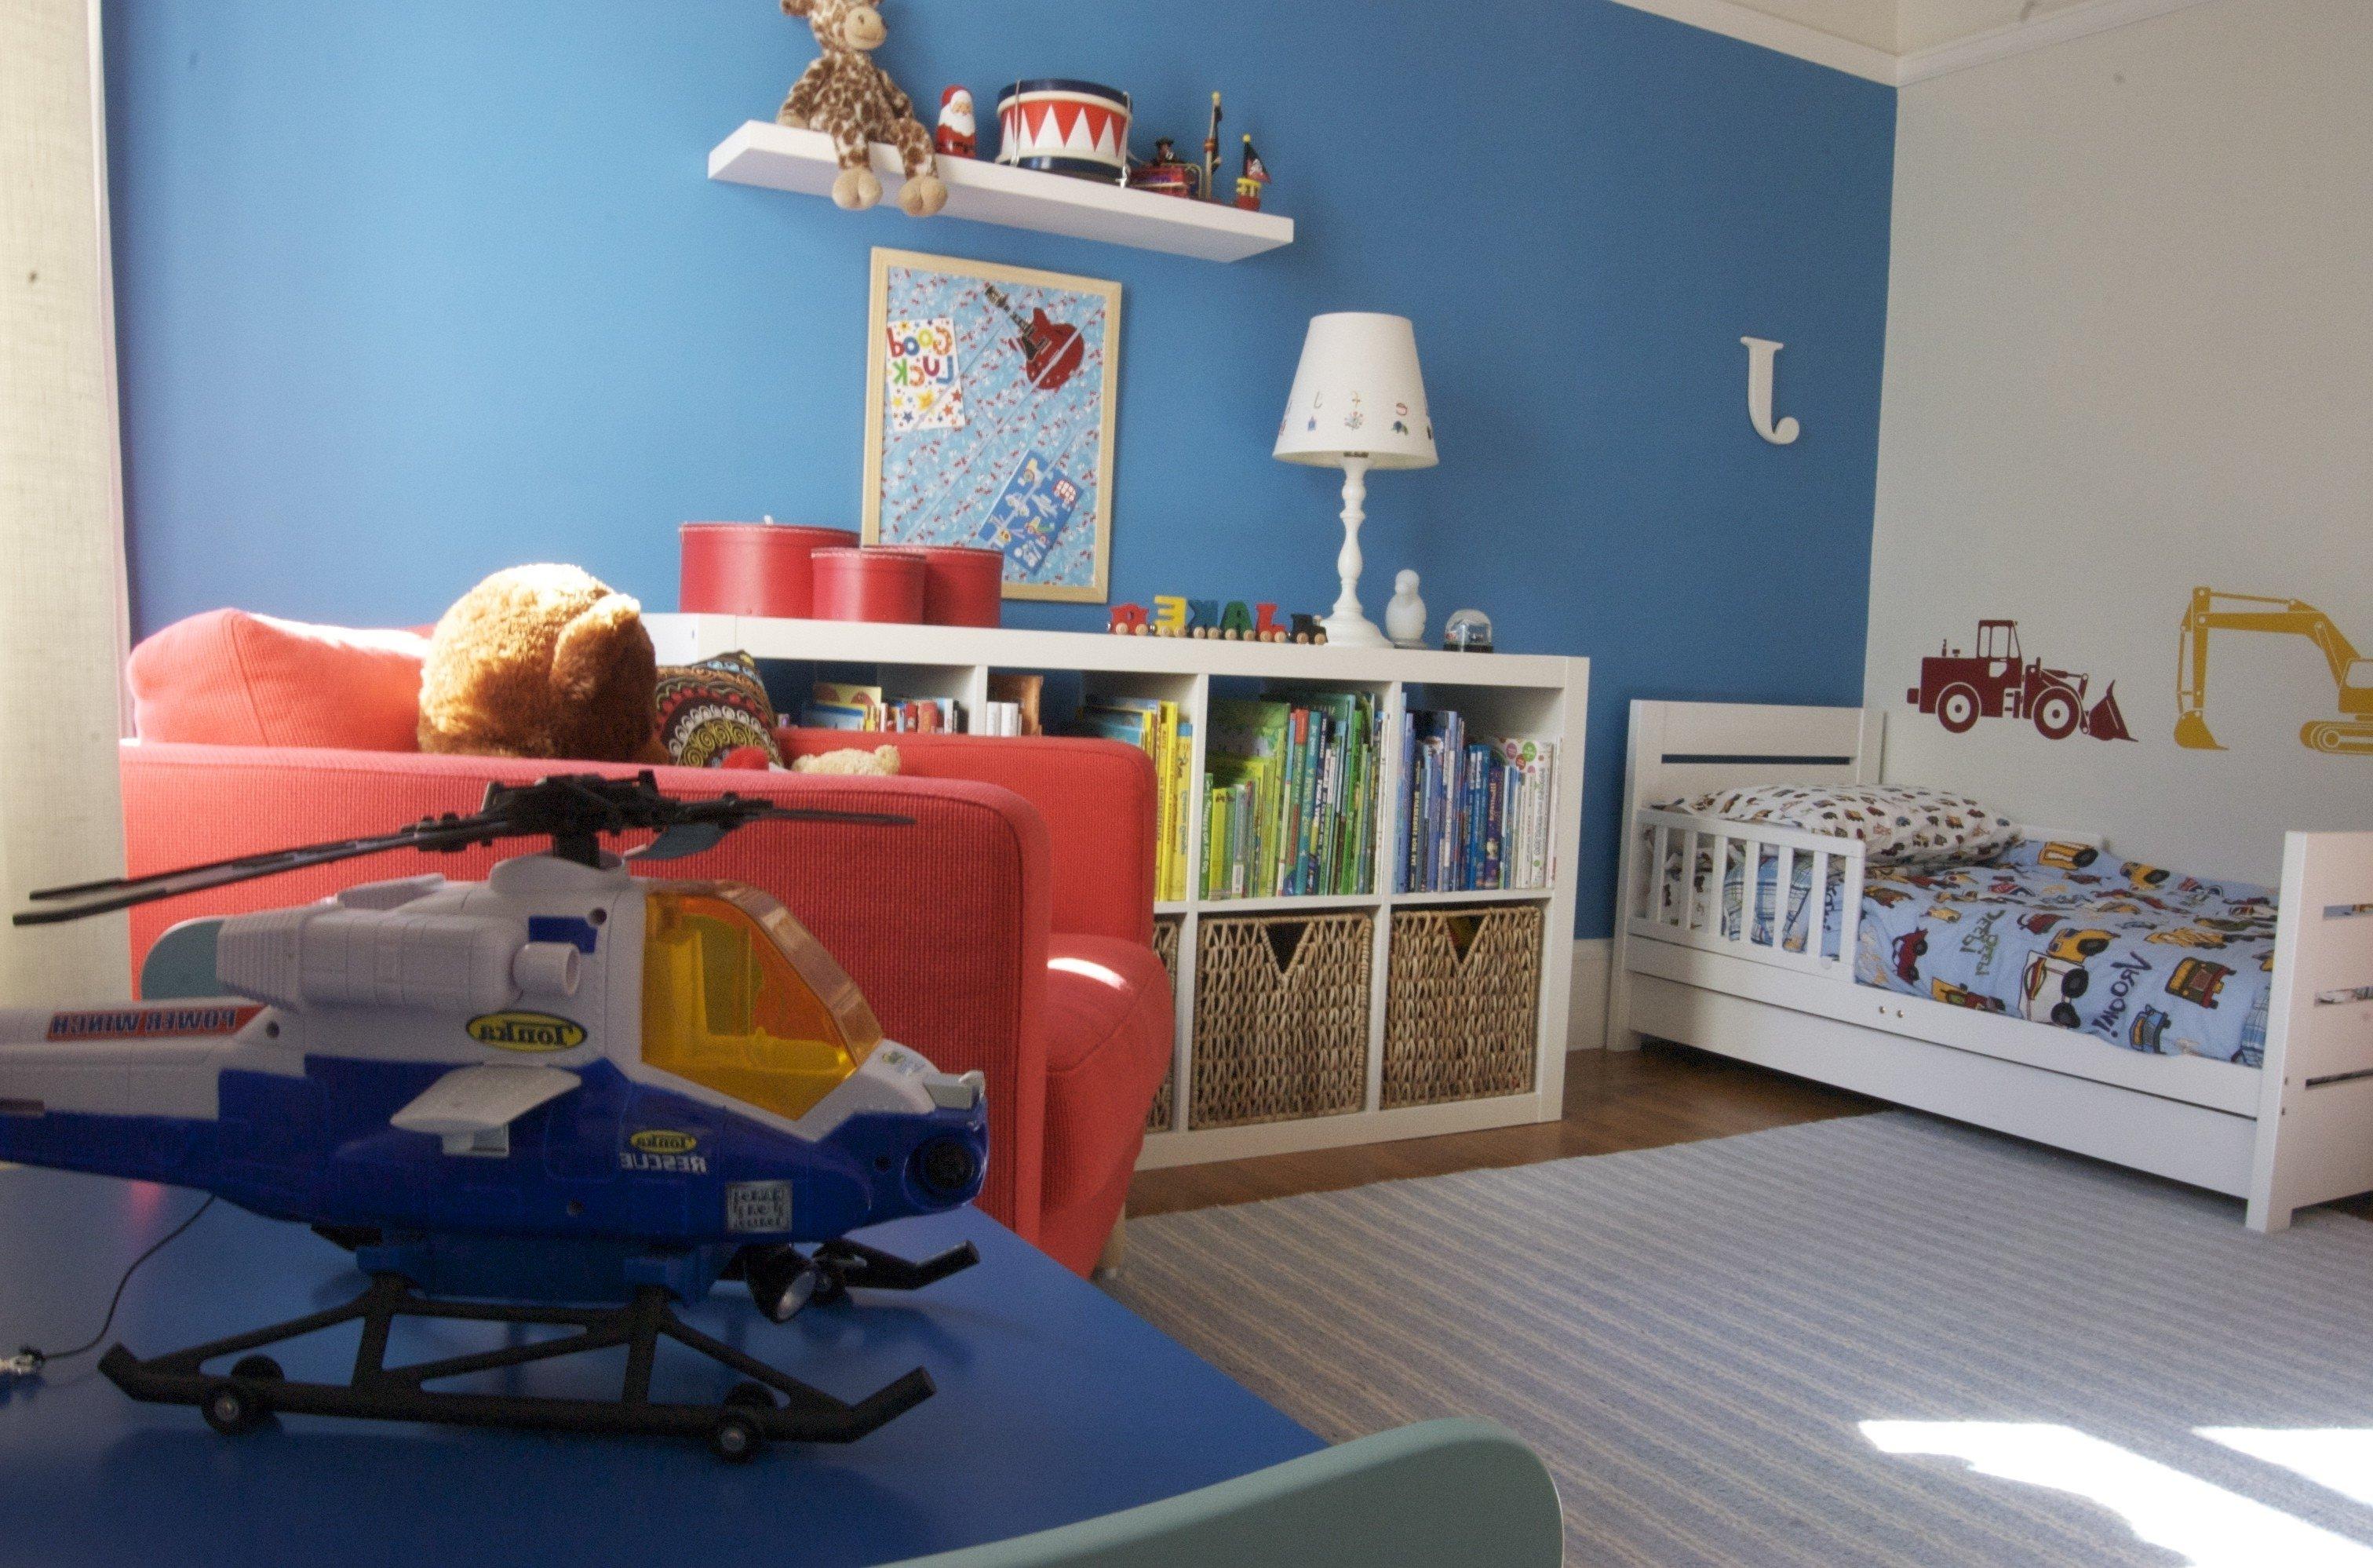 10 Fantastic Toddler Room Ideas For Boys toddler room ideas for boys stunning home ideas